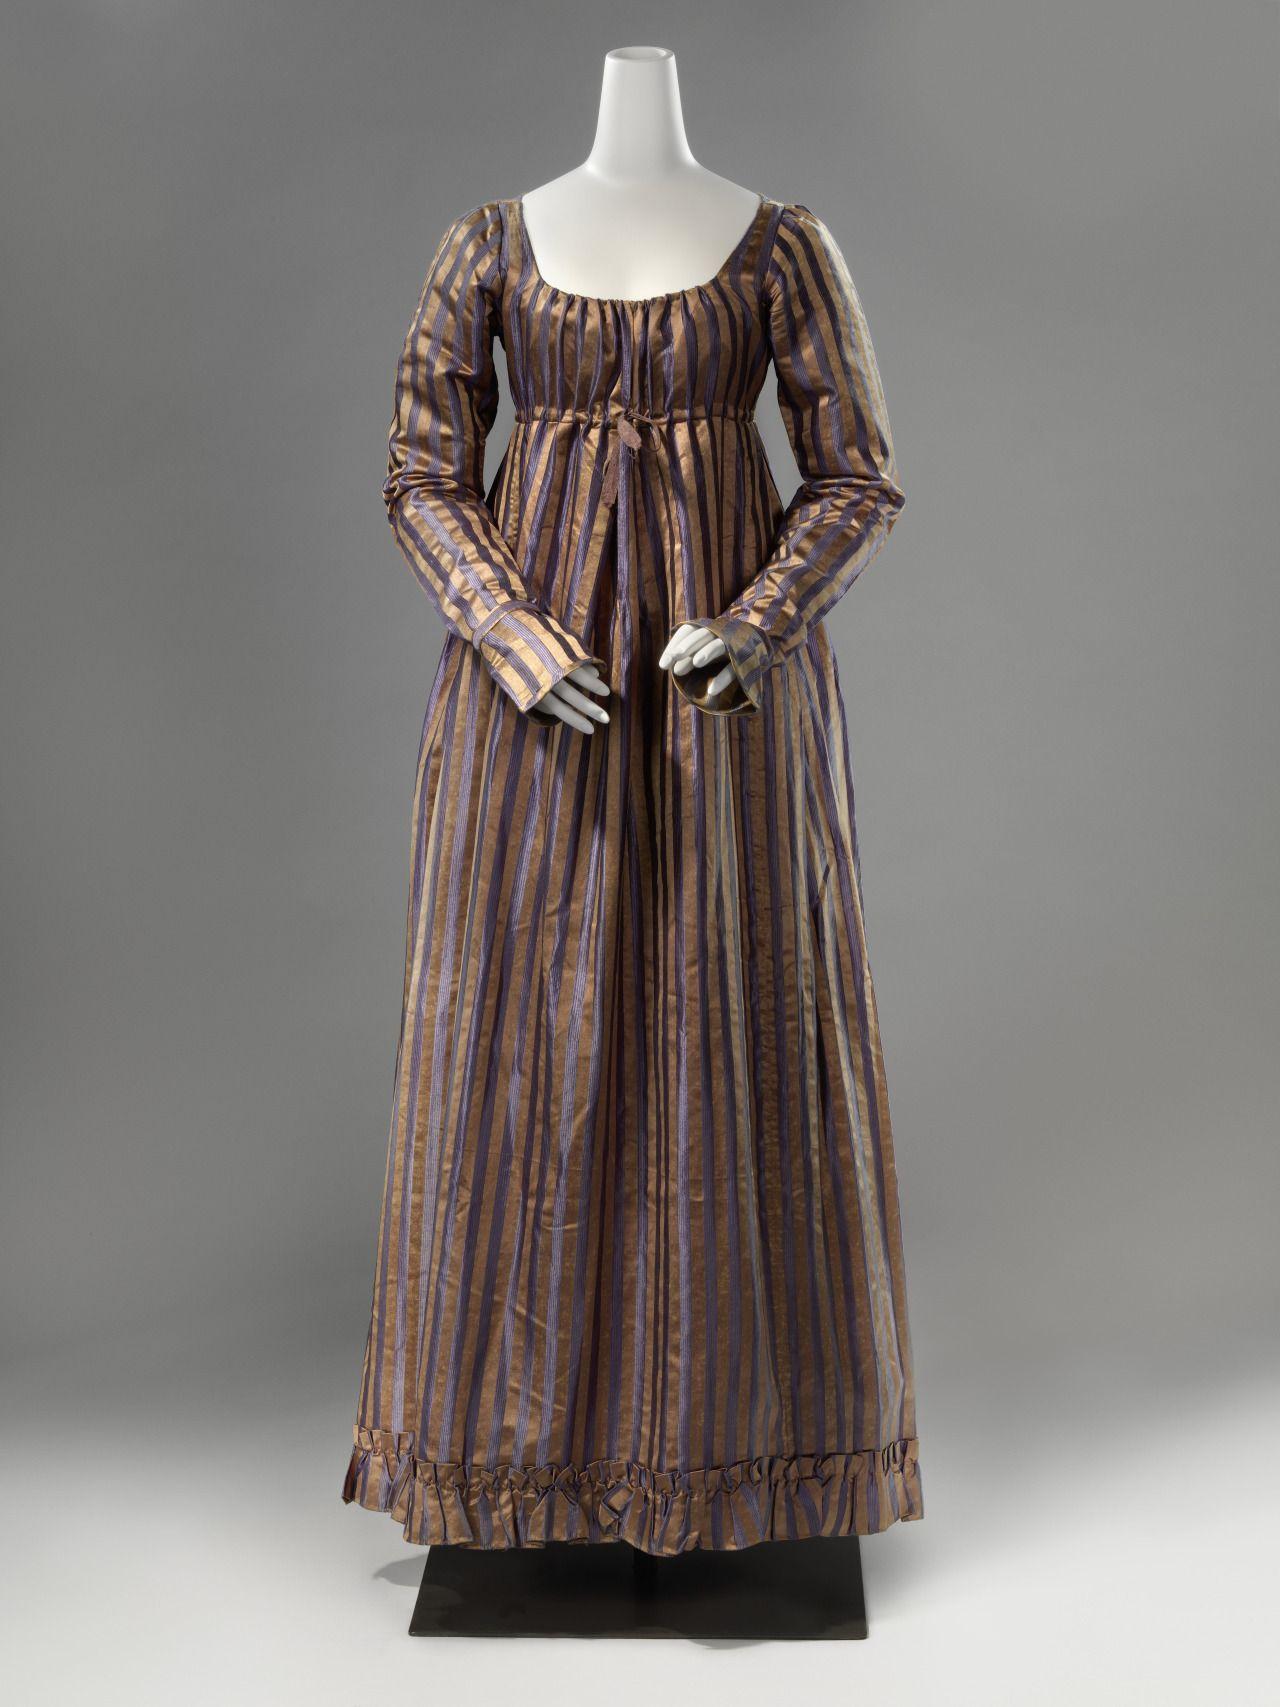 Fashion And Costume History Fashion Historical Dresses Regency Dress [ 1707 x 1280 Pixel ]